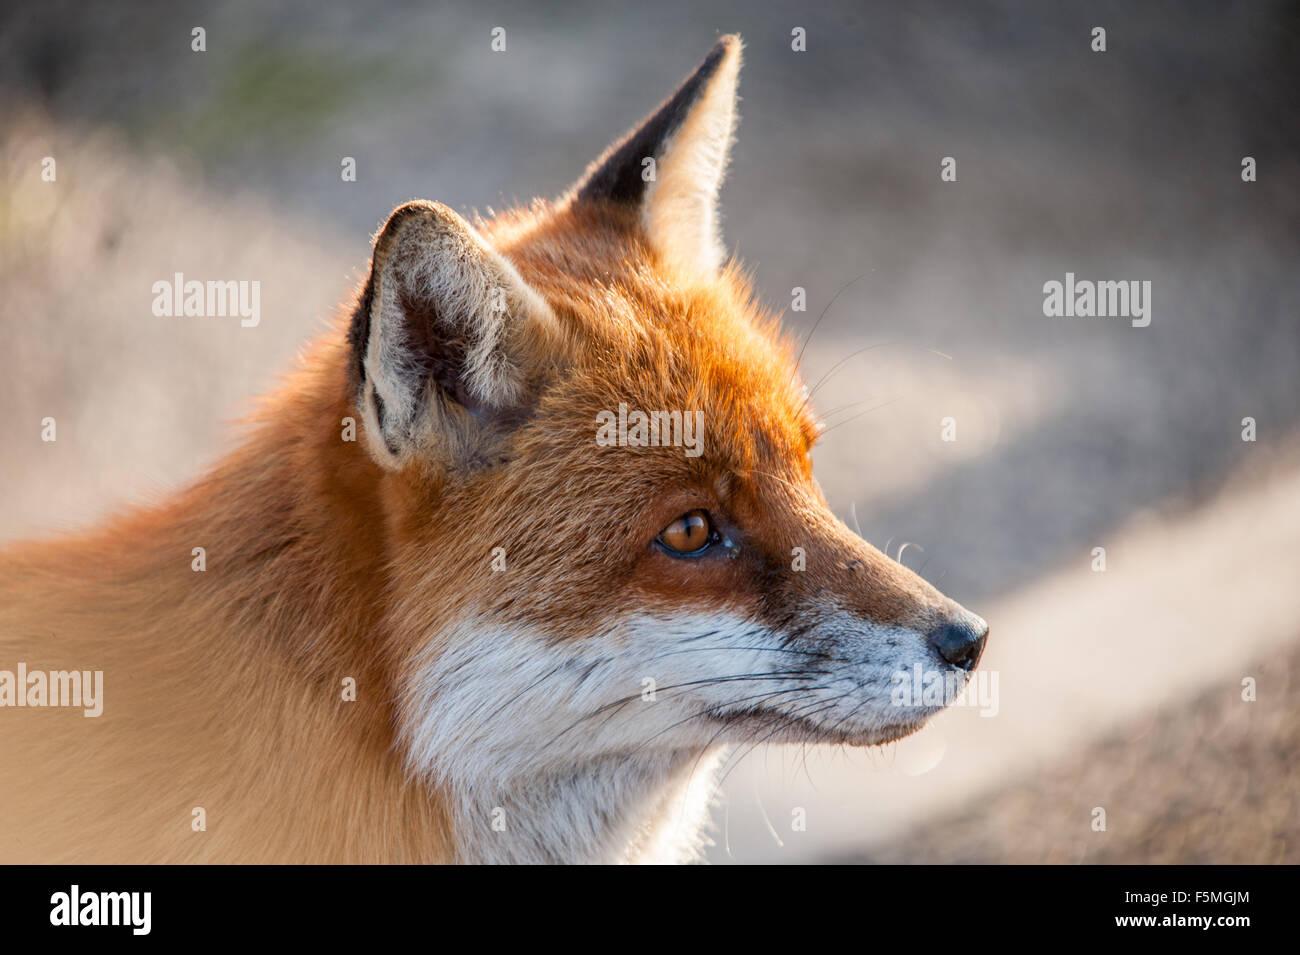 Fox Head Close Up Stock Photo Alamy